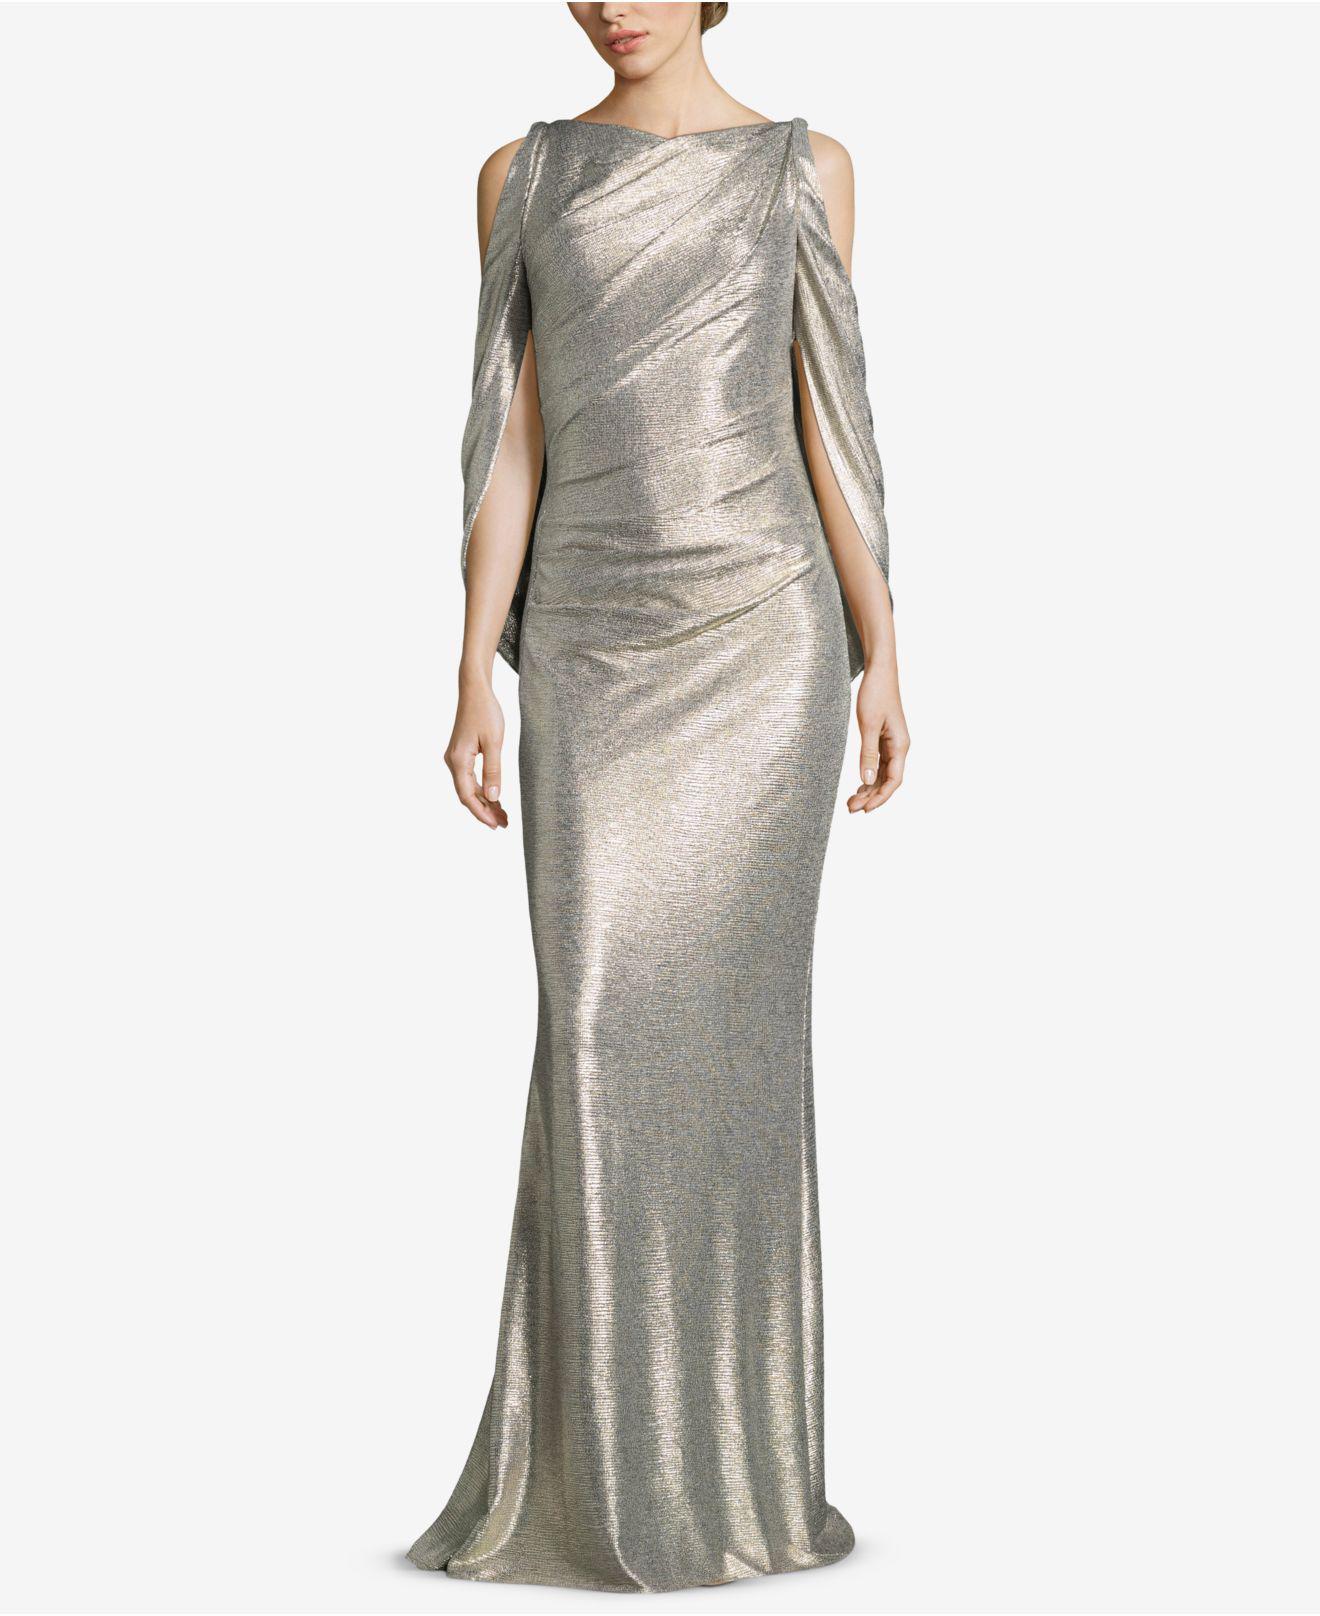 18dfd74e185 Lyst - Betsy   Adam Cold-shoulder Metallic Gown in Metallic